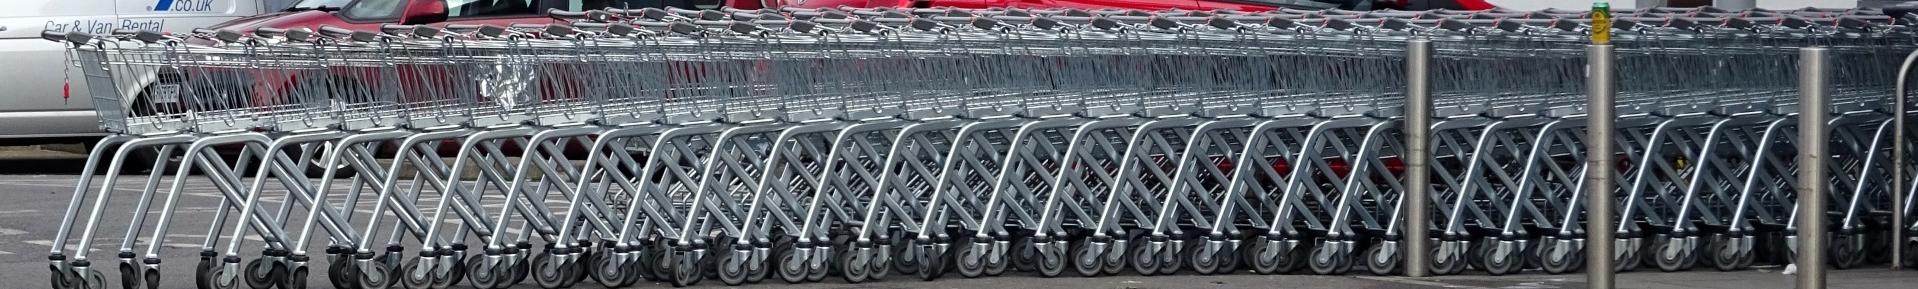 supermarket-shopping-carts.jpg